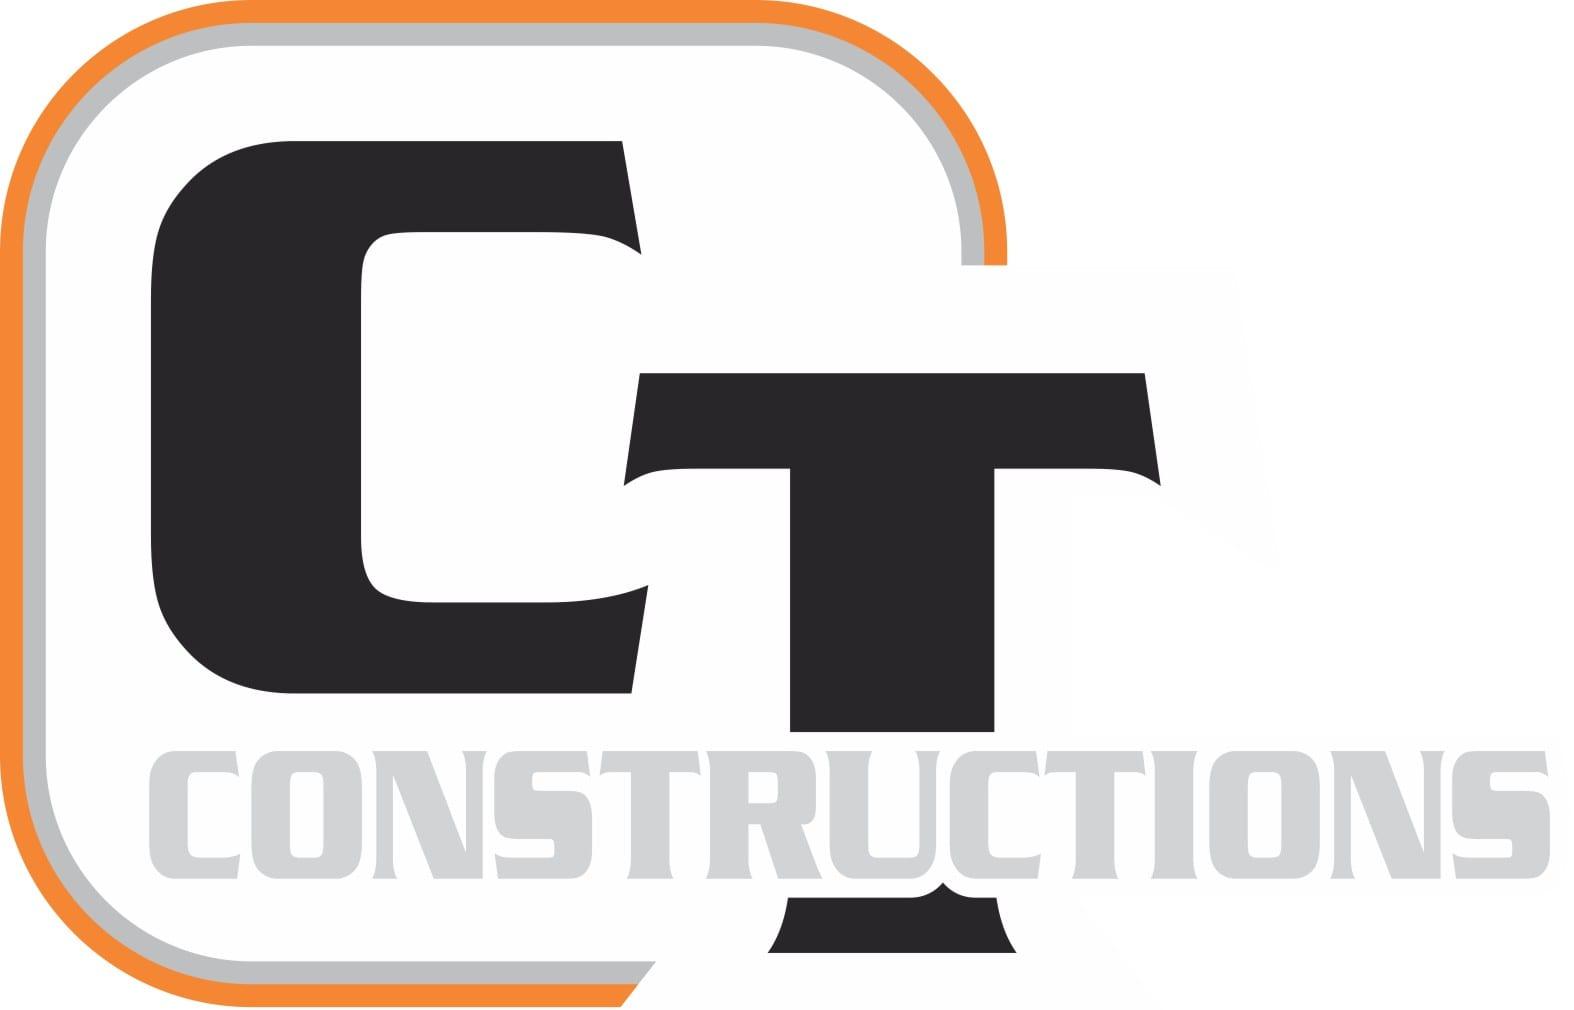 C T Contructions Final Logo Std